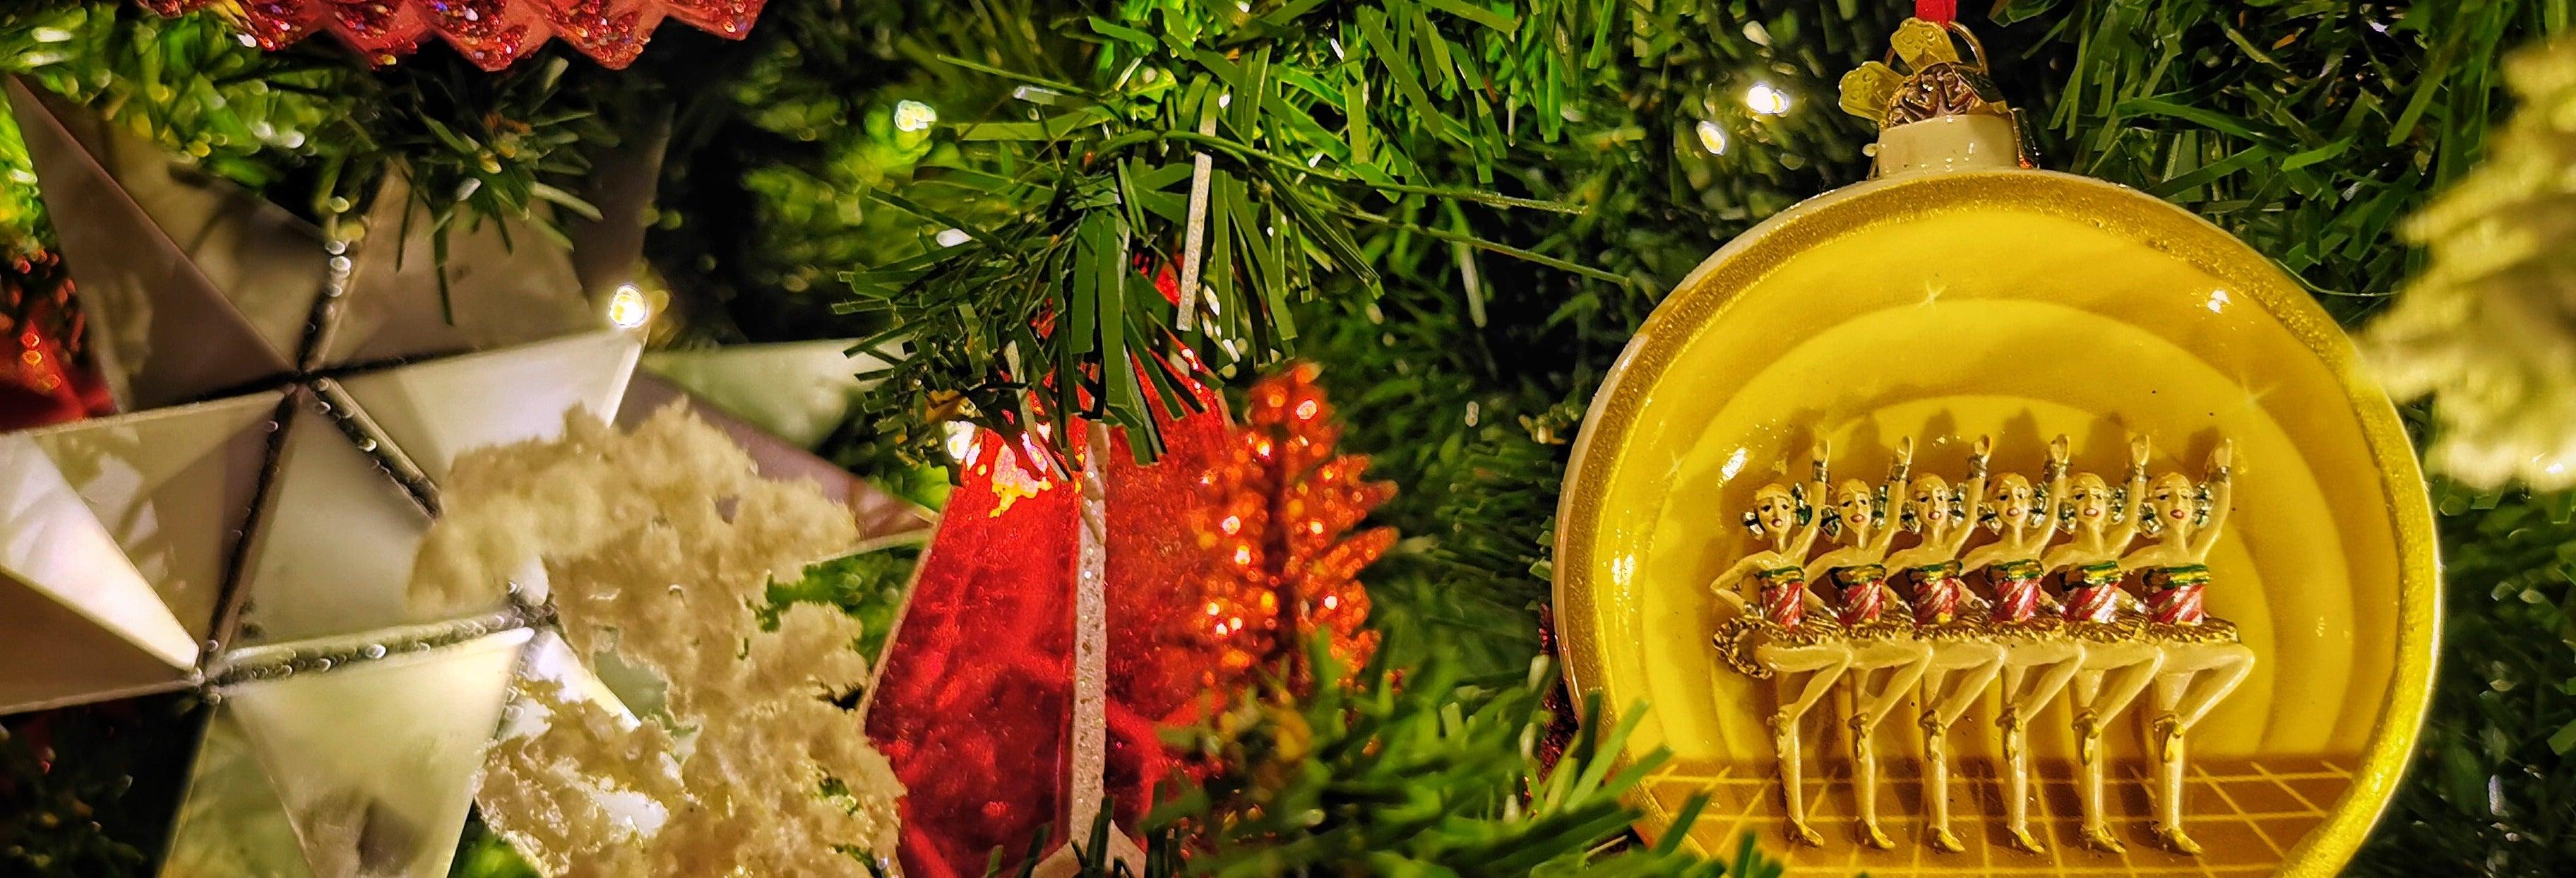 Entrada para Christmas Spectacular en Radio City Music Hall